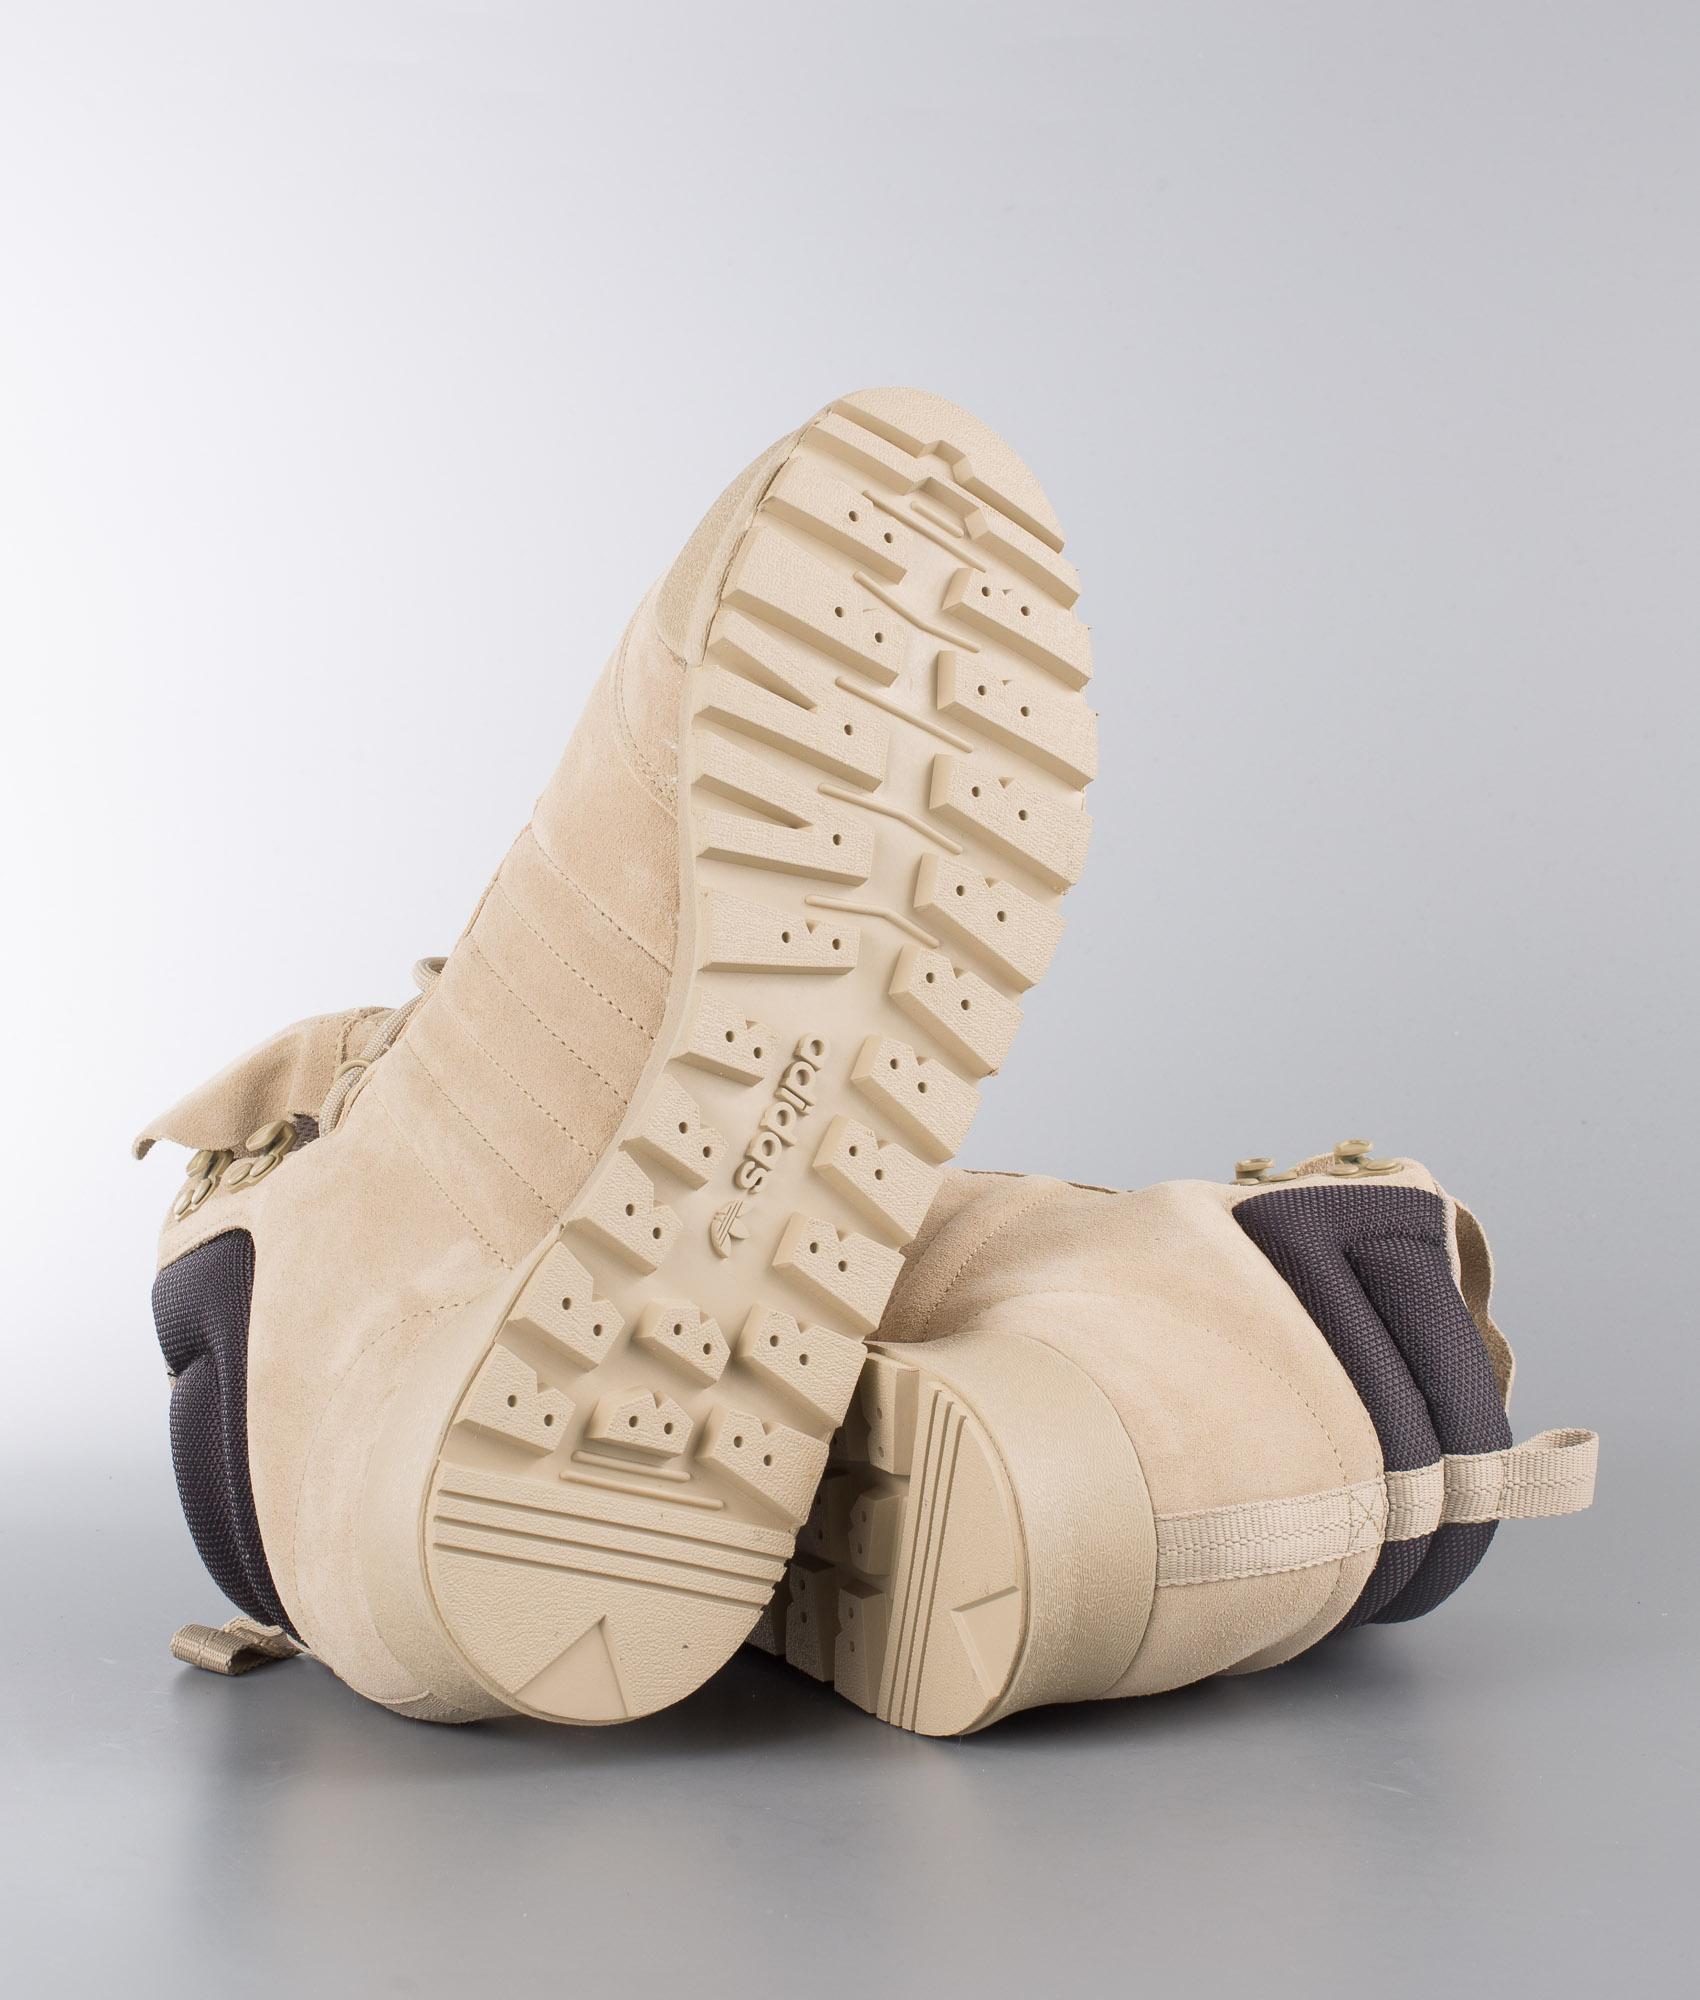 De 2 0 Skateboarding Raw Gold Chez Chaussures Adidas Boot Jake XPw1qxqHg